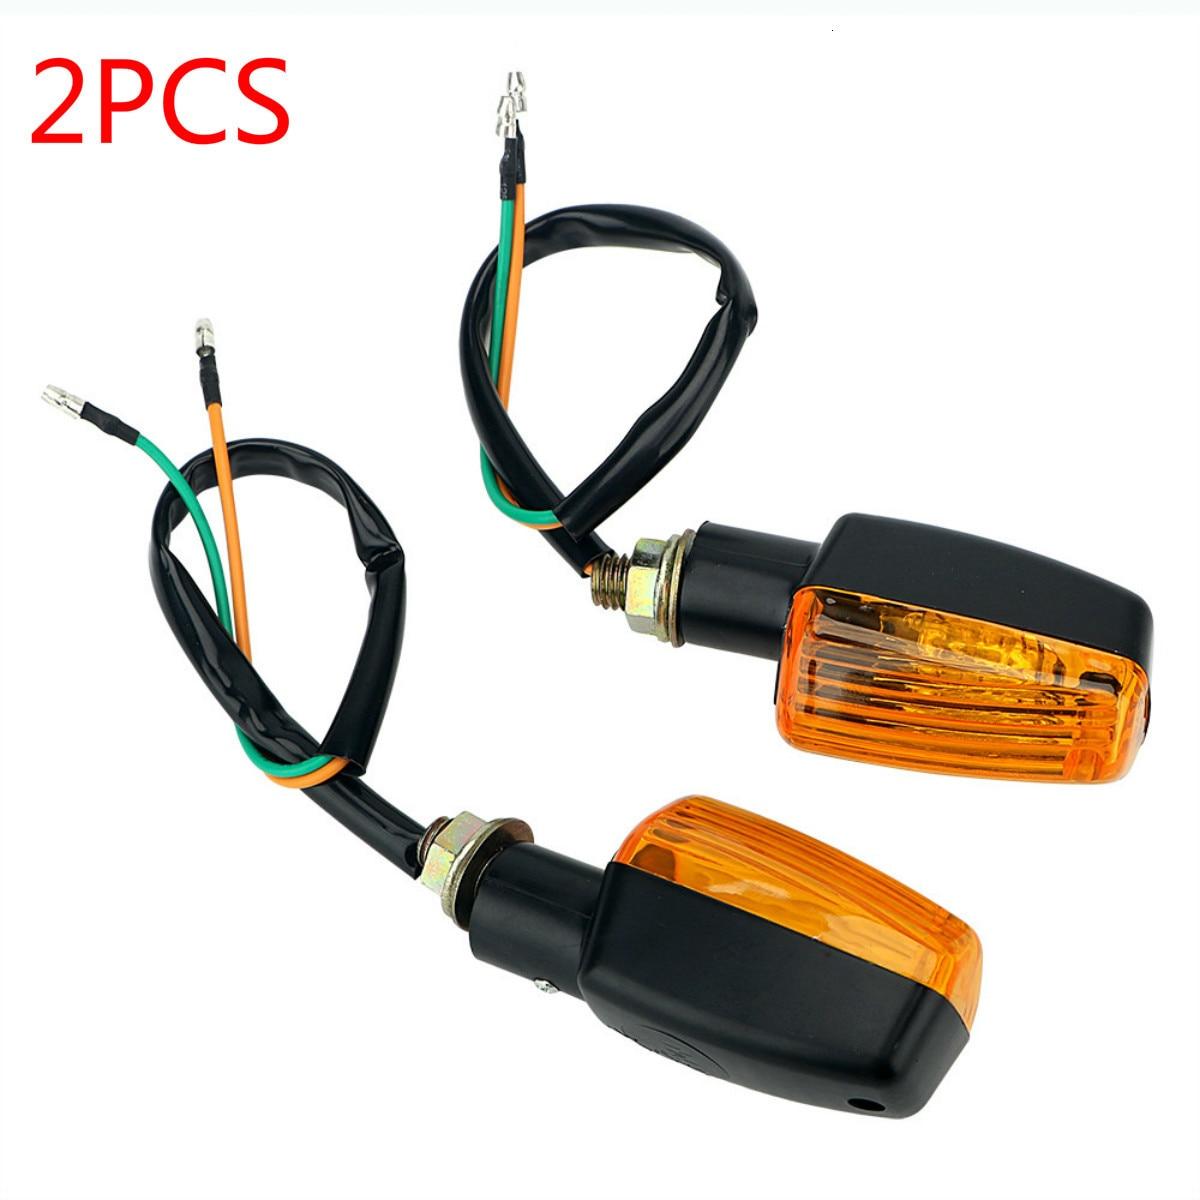 1 Pair Motorcycle Flasher Blub Turn Signal Lamp Universal DC 12V Motorbike Indicator Light Amber Blinker Bulb 8W